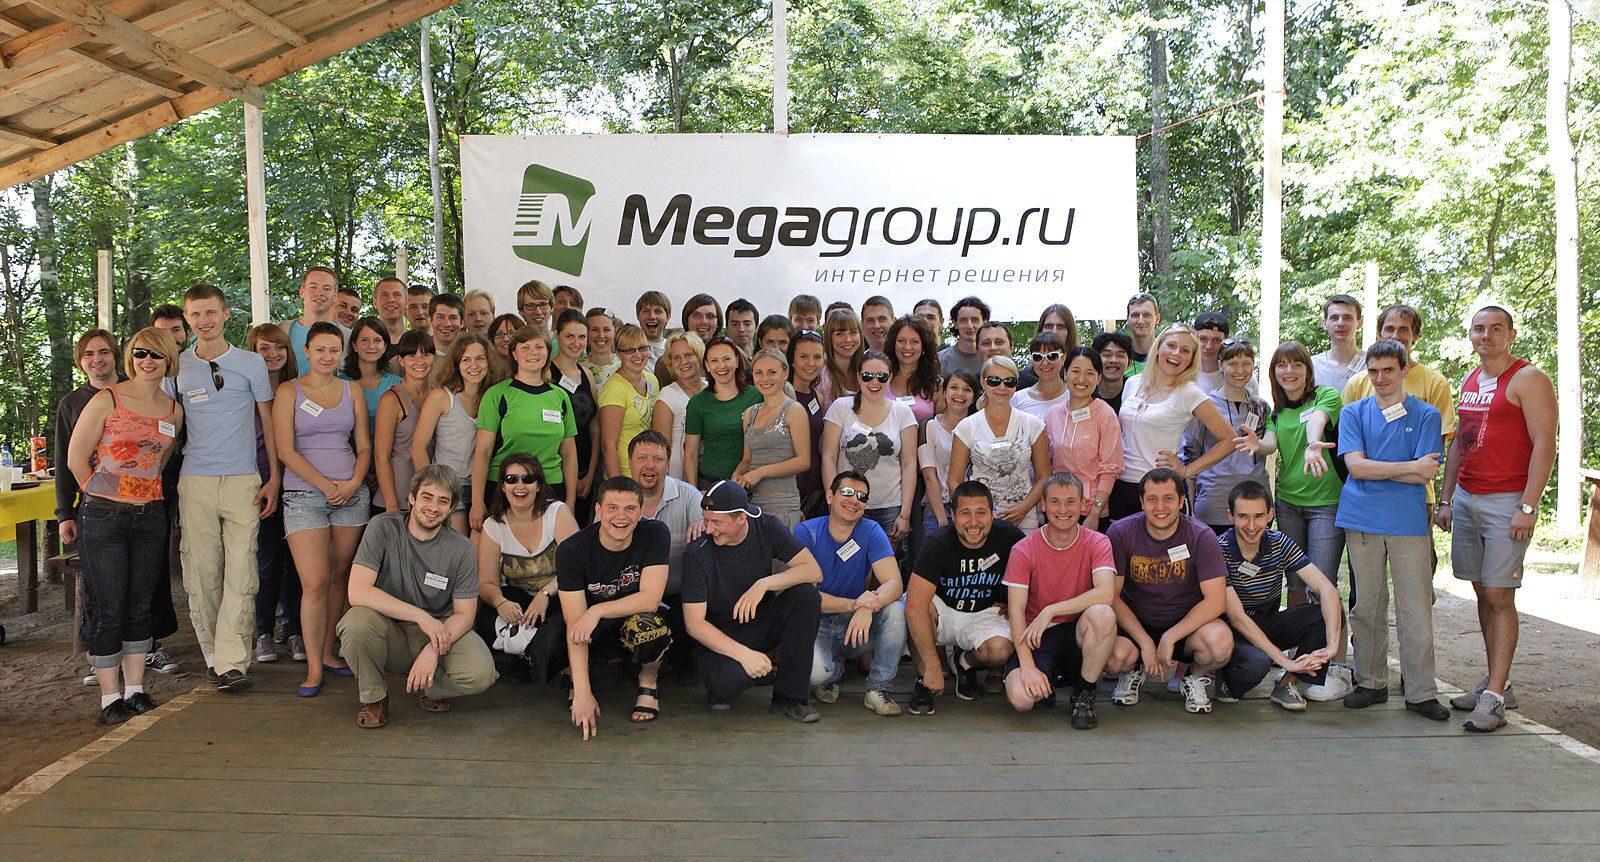 Тимбилдинг Megagroup.ru лето 2012